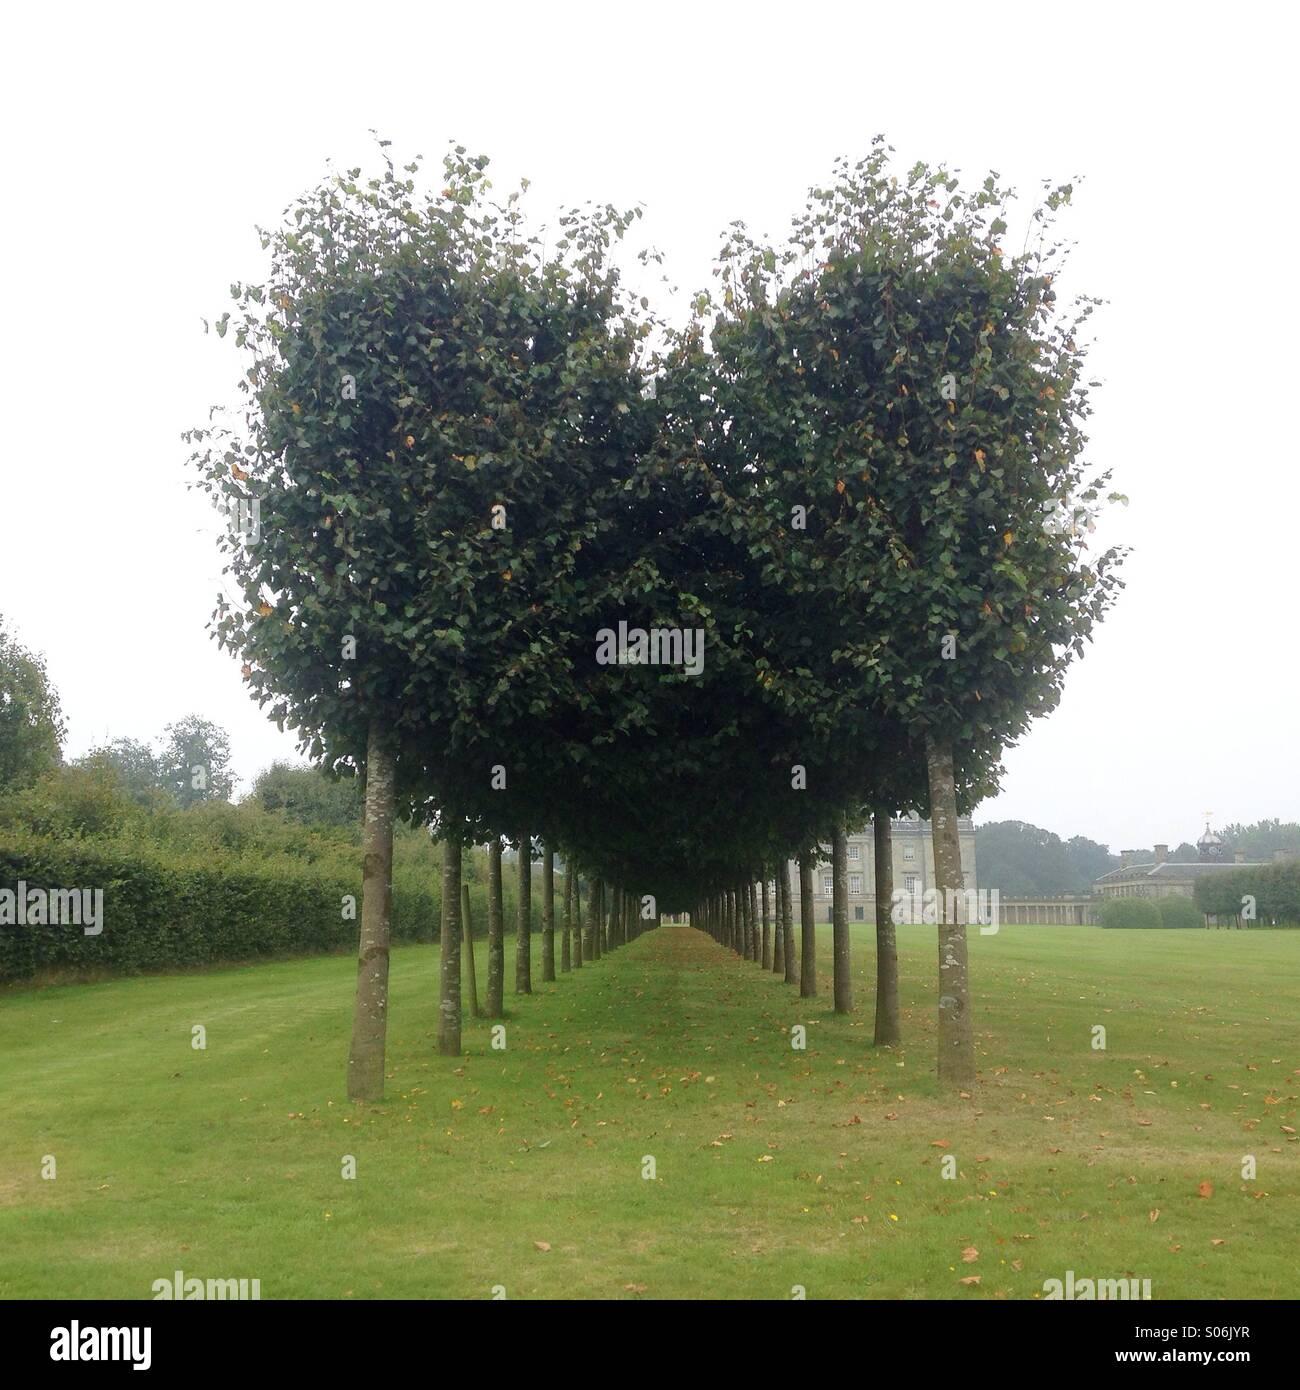 Liebe herzförmige Bäume. Stockfoto